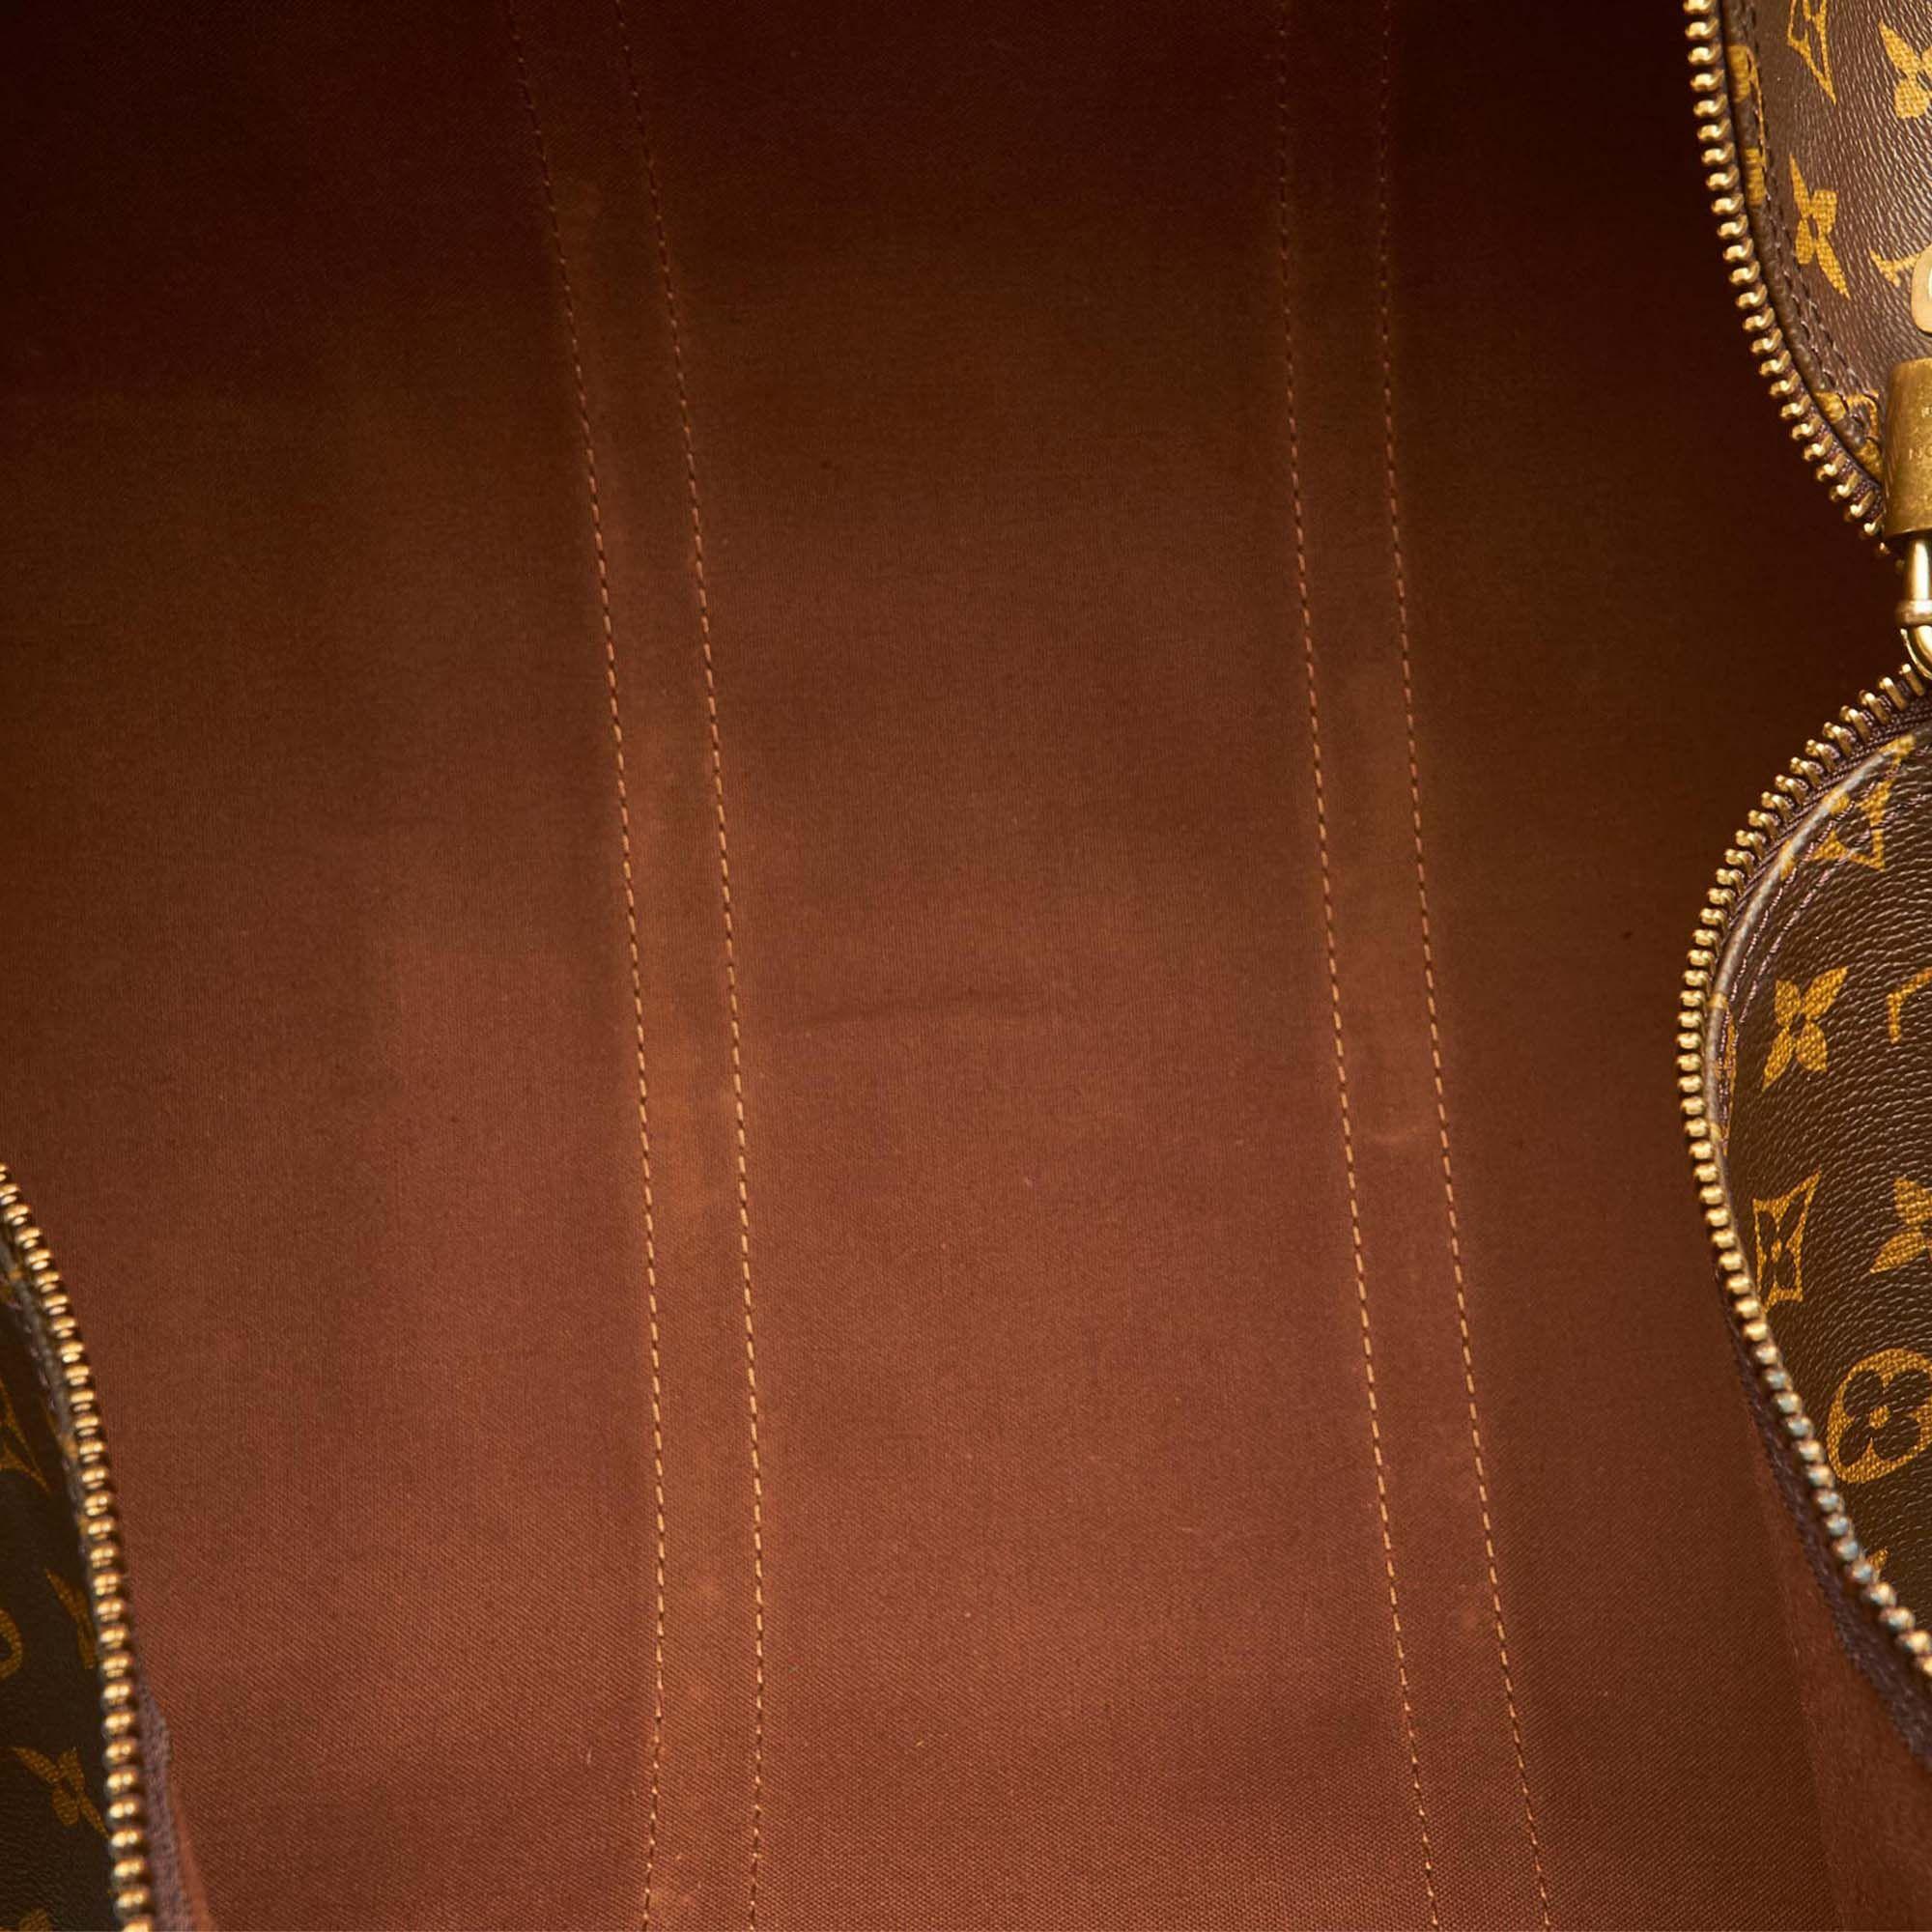 Vintage Louis Vuitton Monogram Keepall 55 Brown